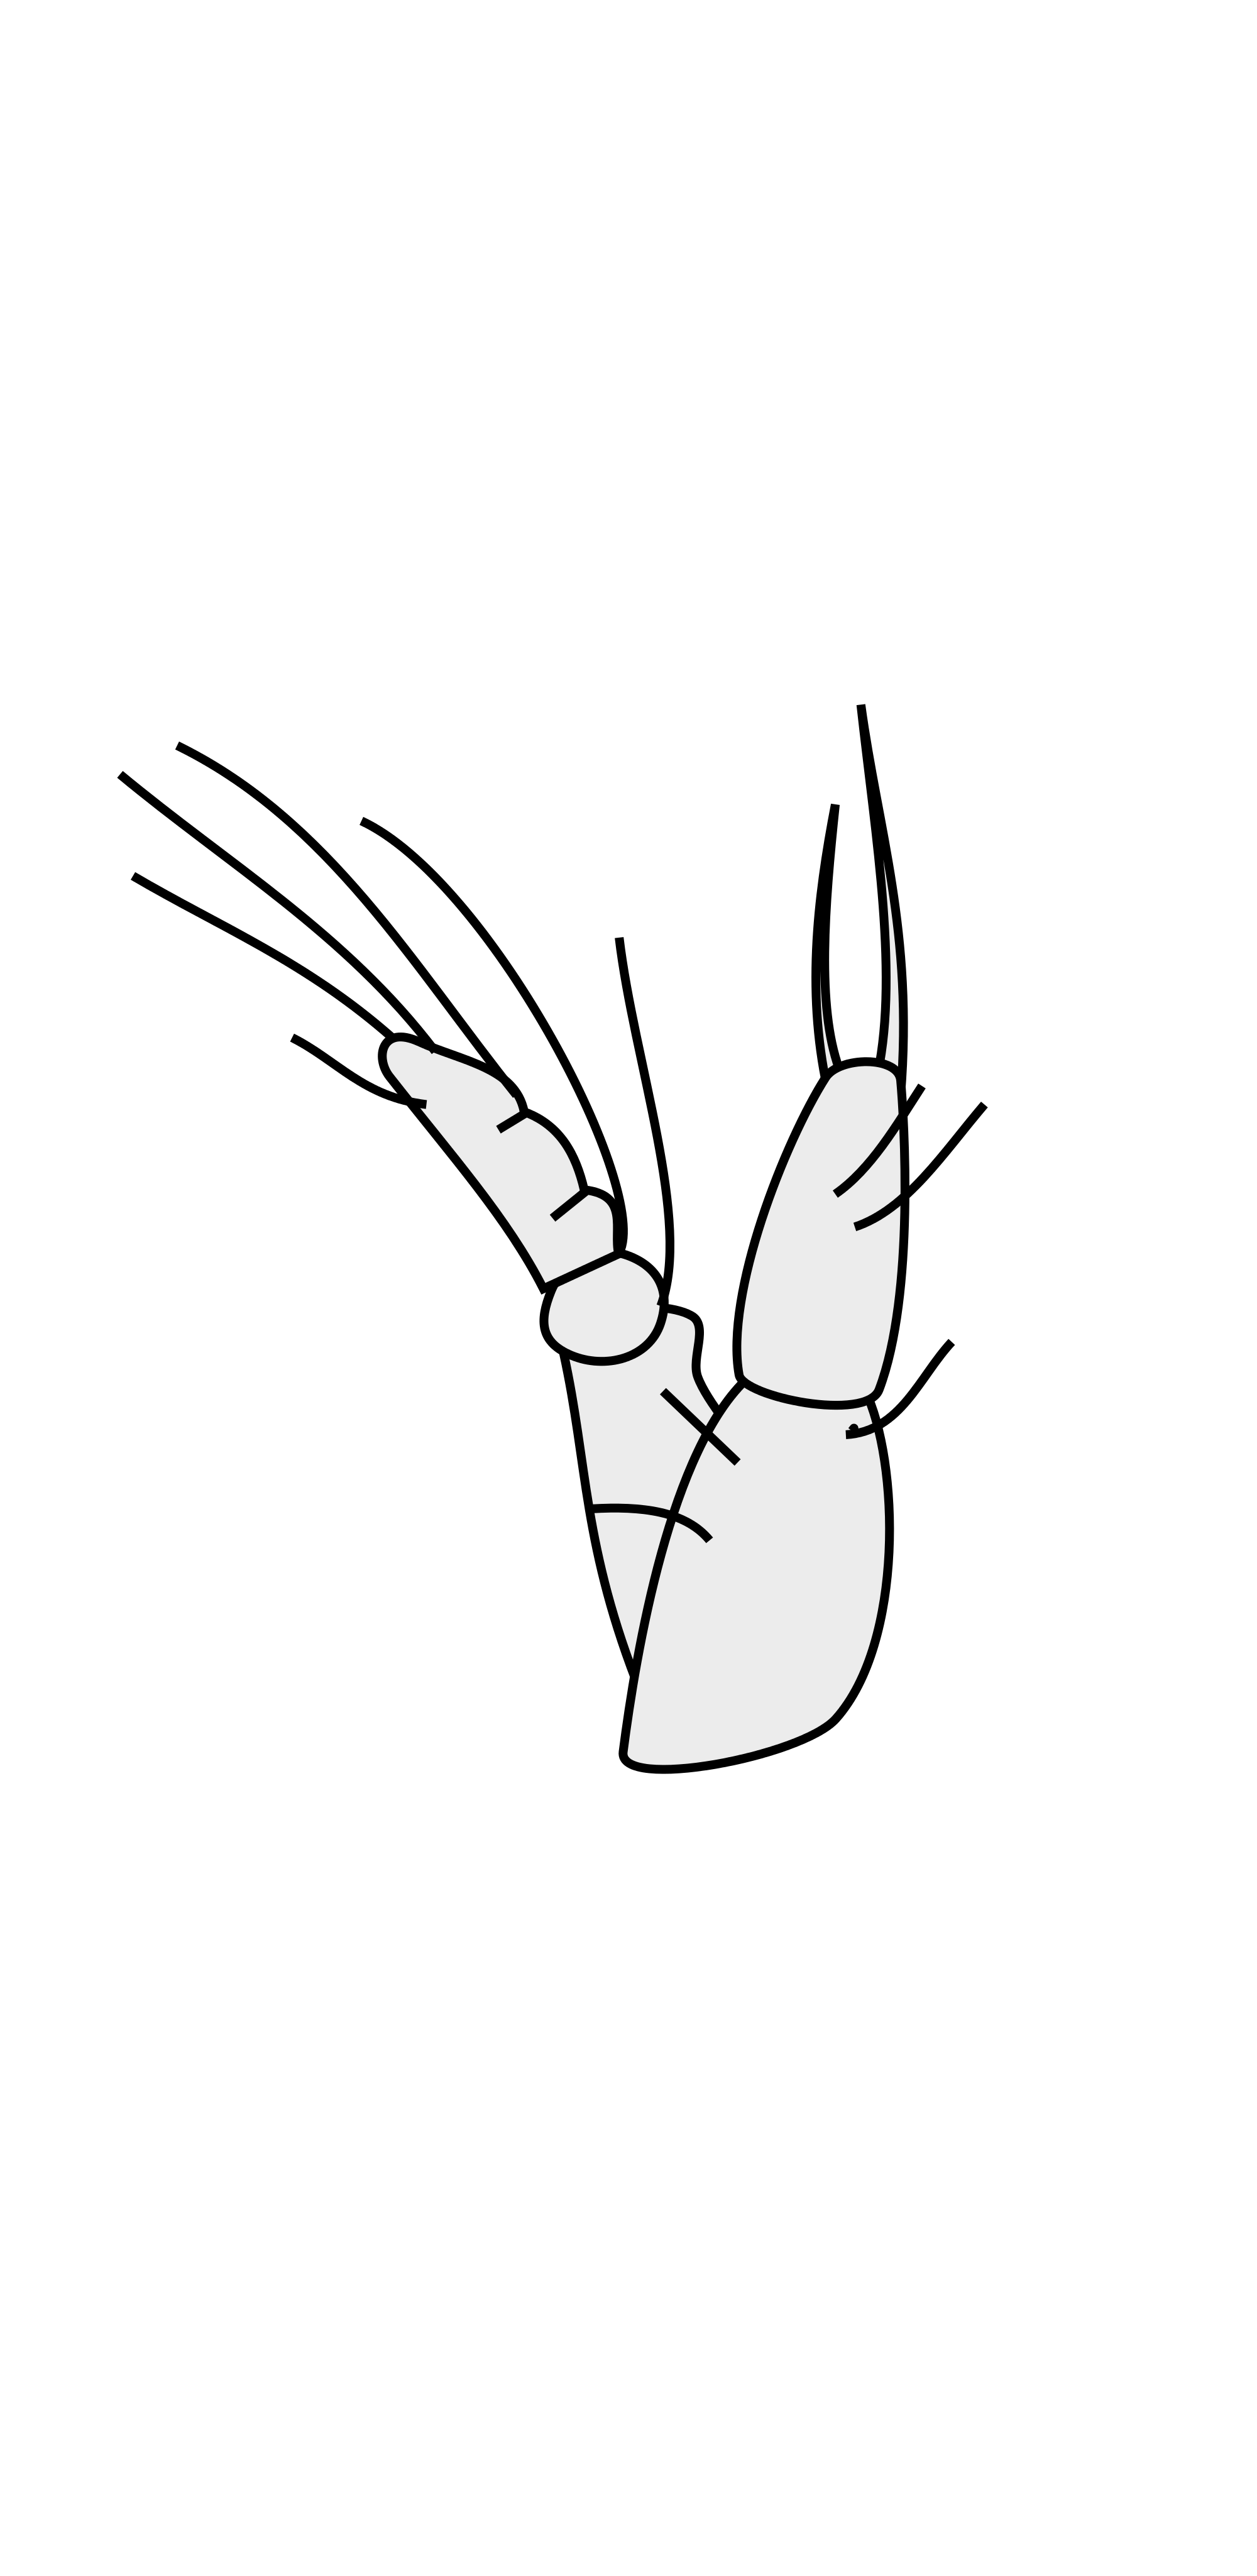 Crustacean svg #9, Download drawings